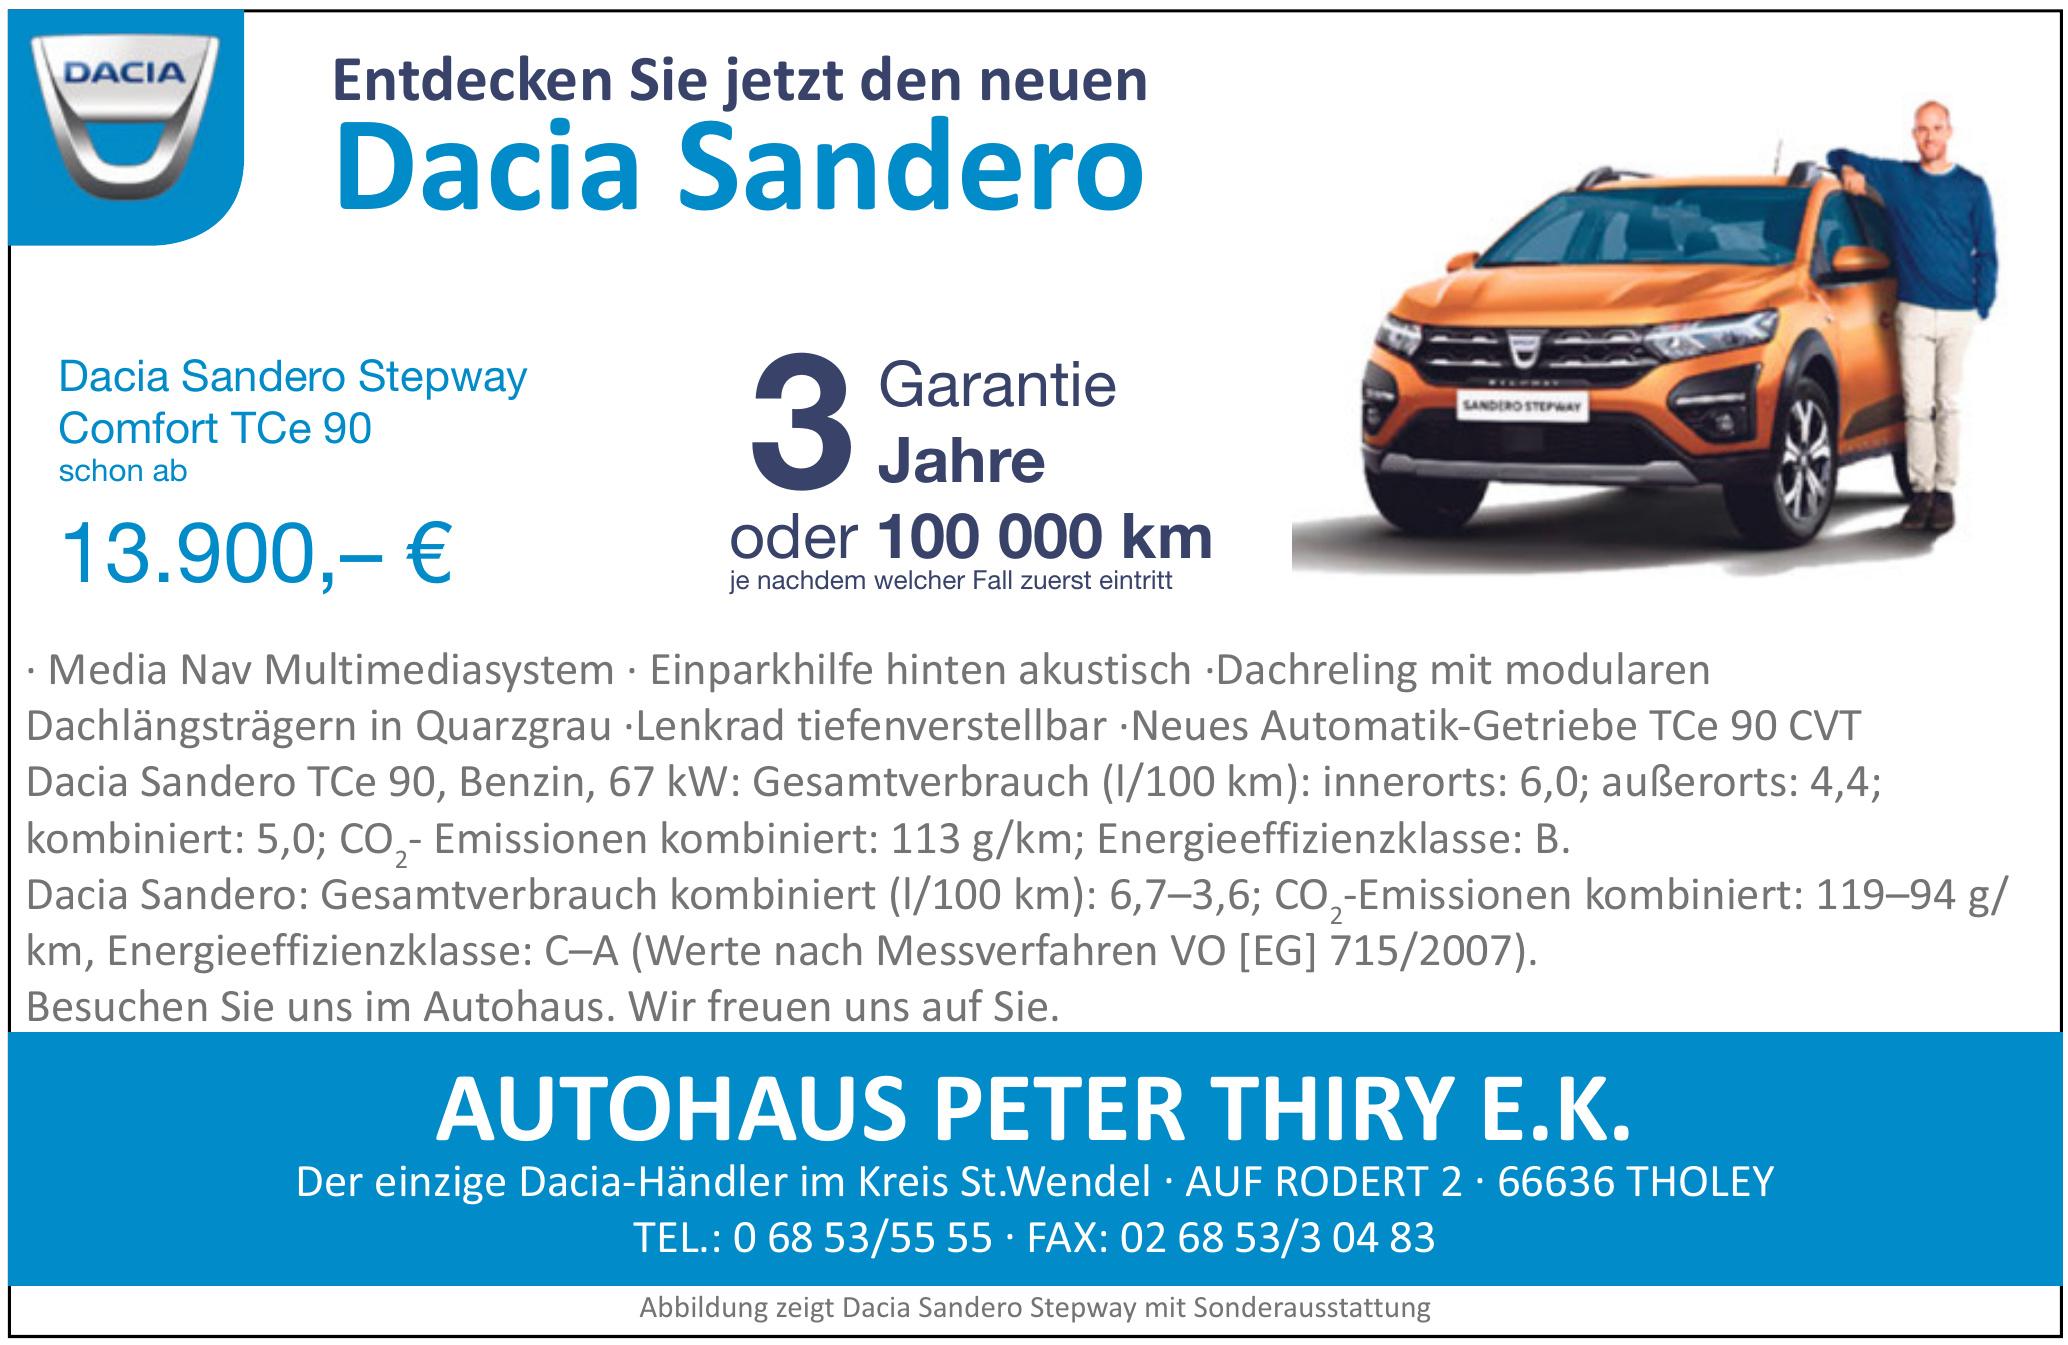 Autohaus Peter Thiry e.K.